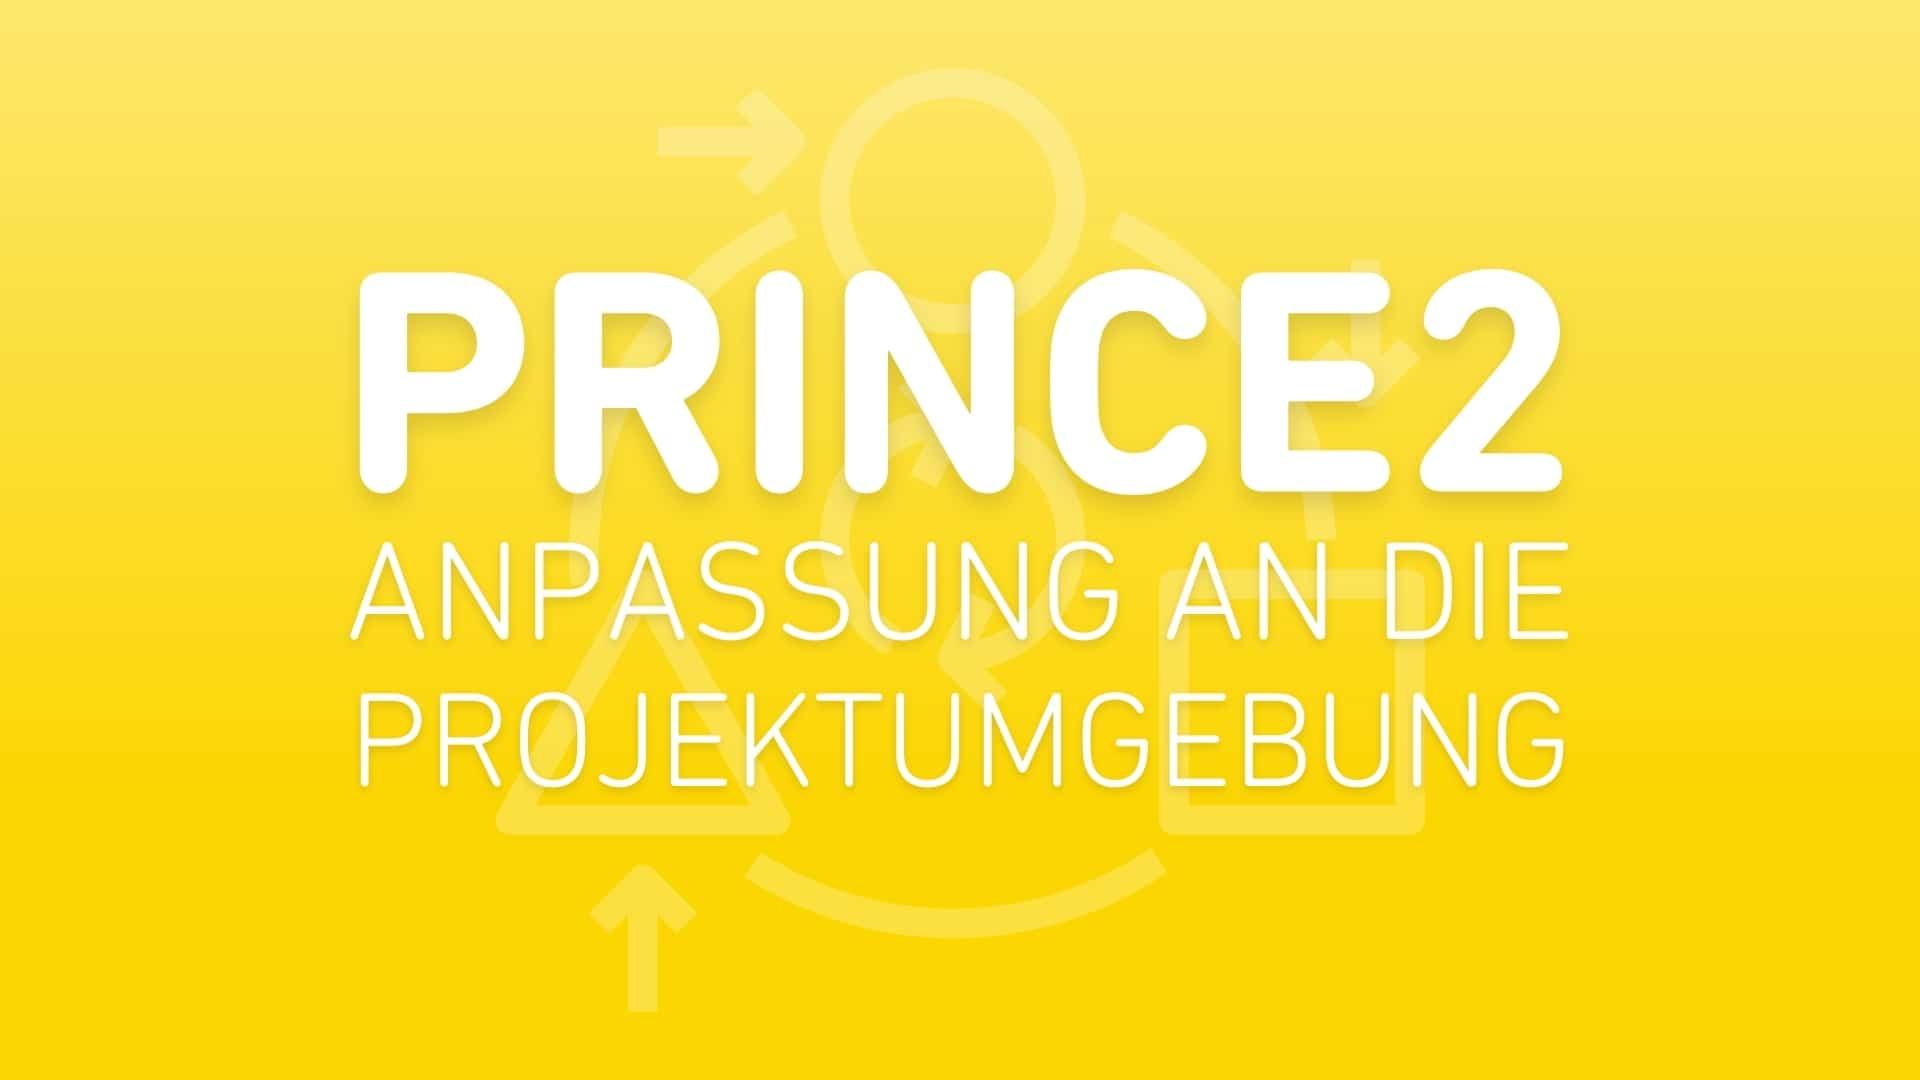 prince2-anpassung-an-die-projektumgebung